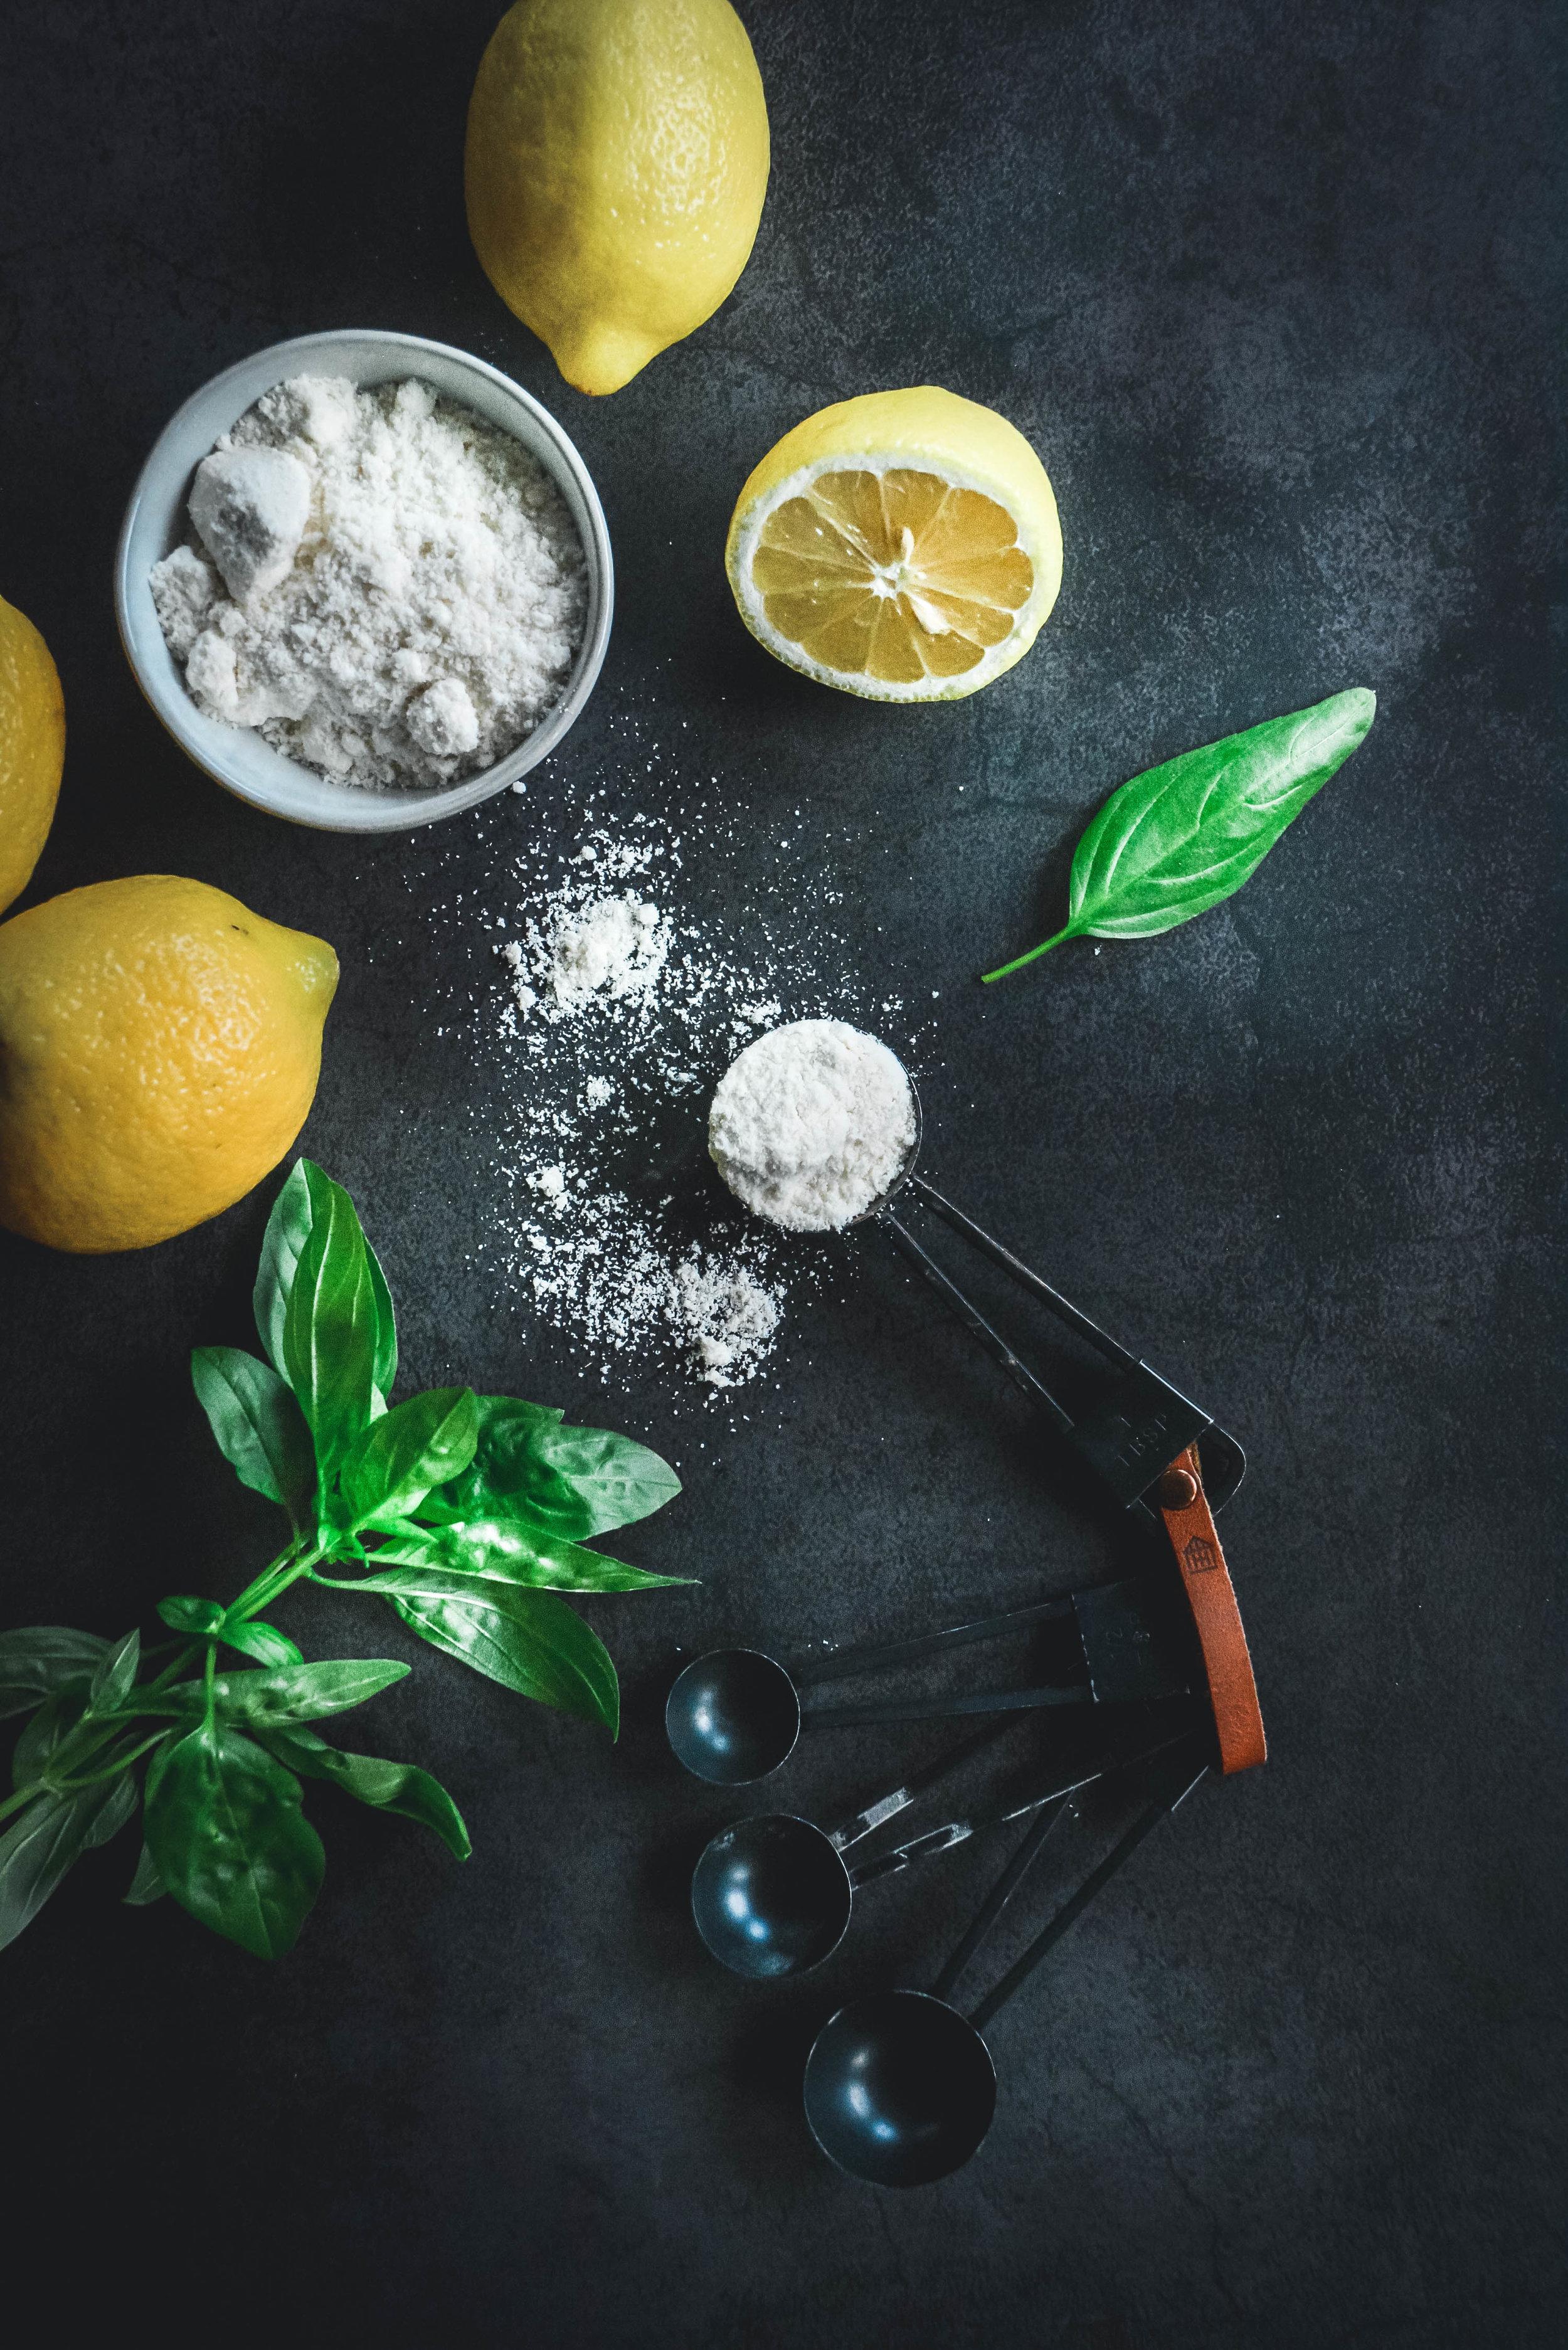 Lemons, coconut flour, measuring spoons, greens